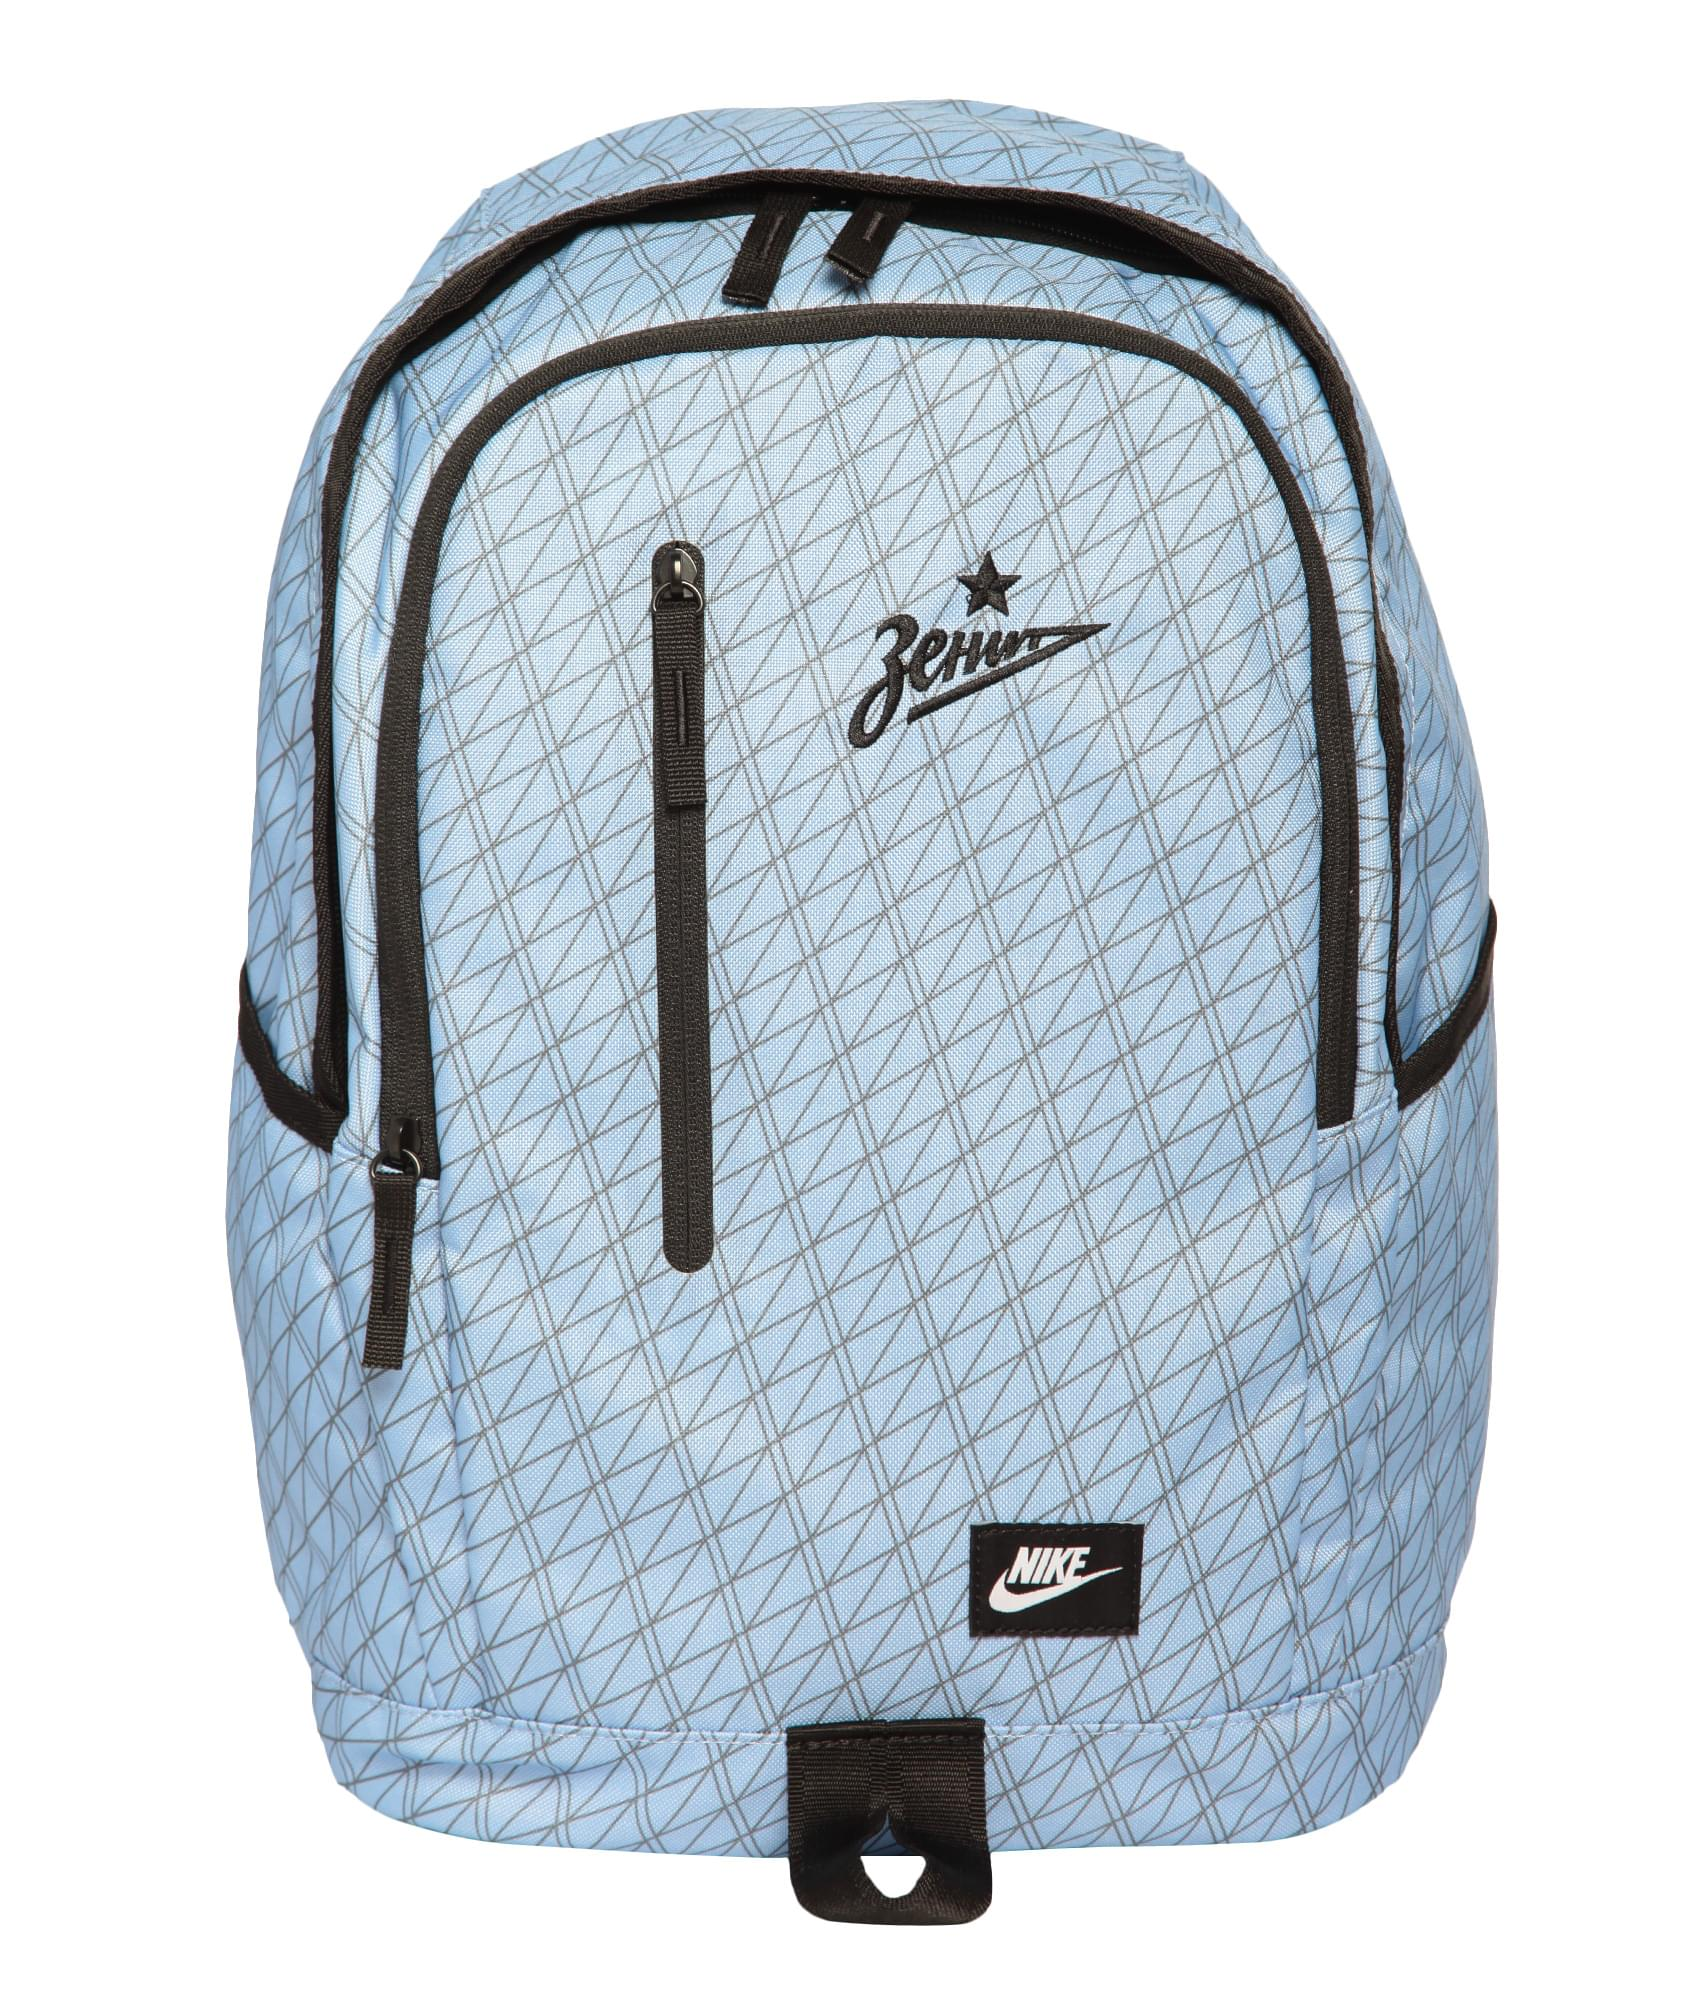 Рюкзак Nike, Цвет-Голубой, Размер-34x13x46 поло nike цвет голубой размер m